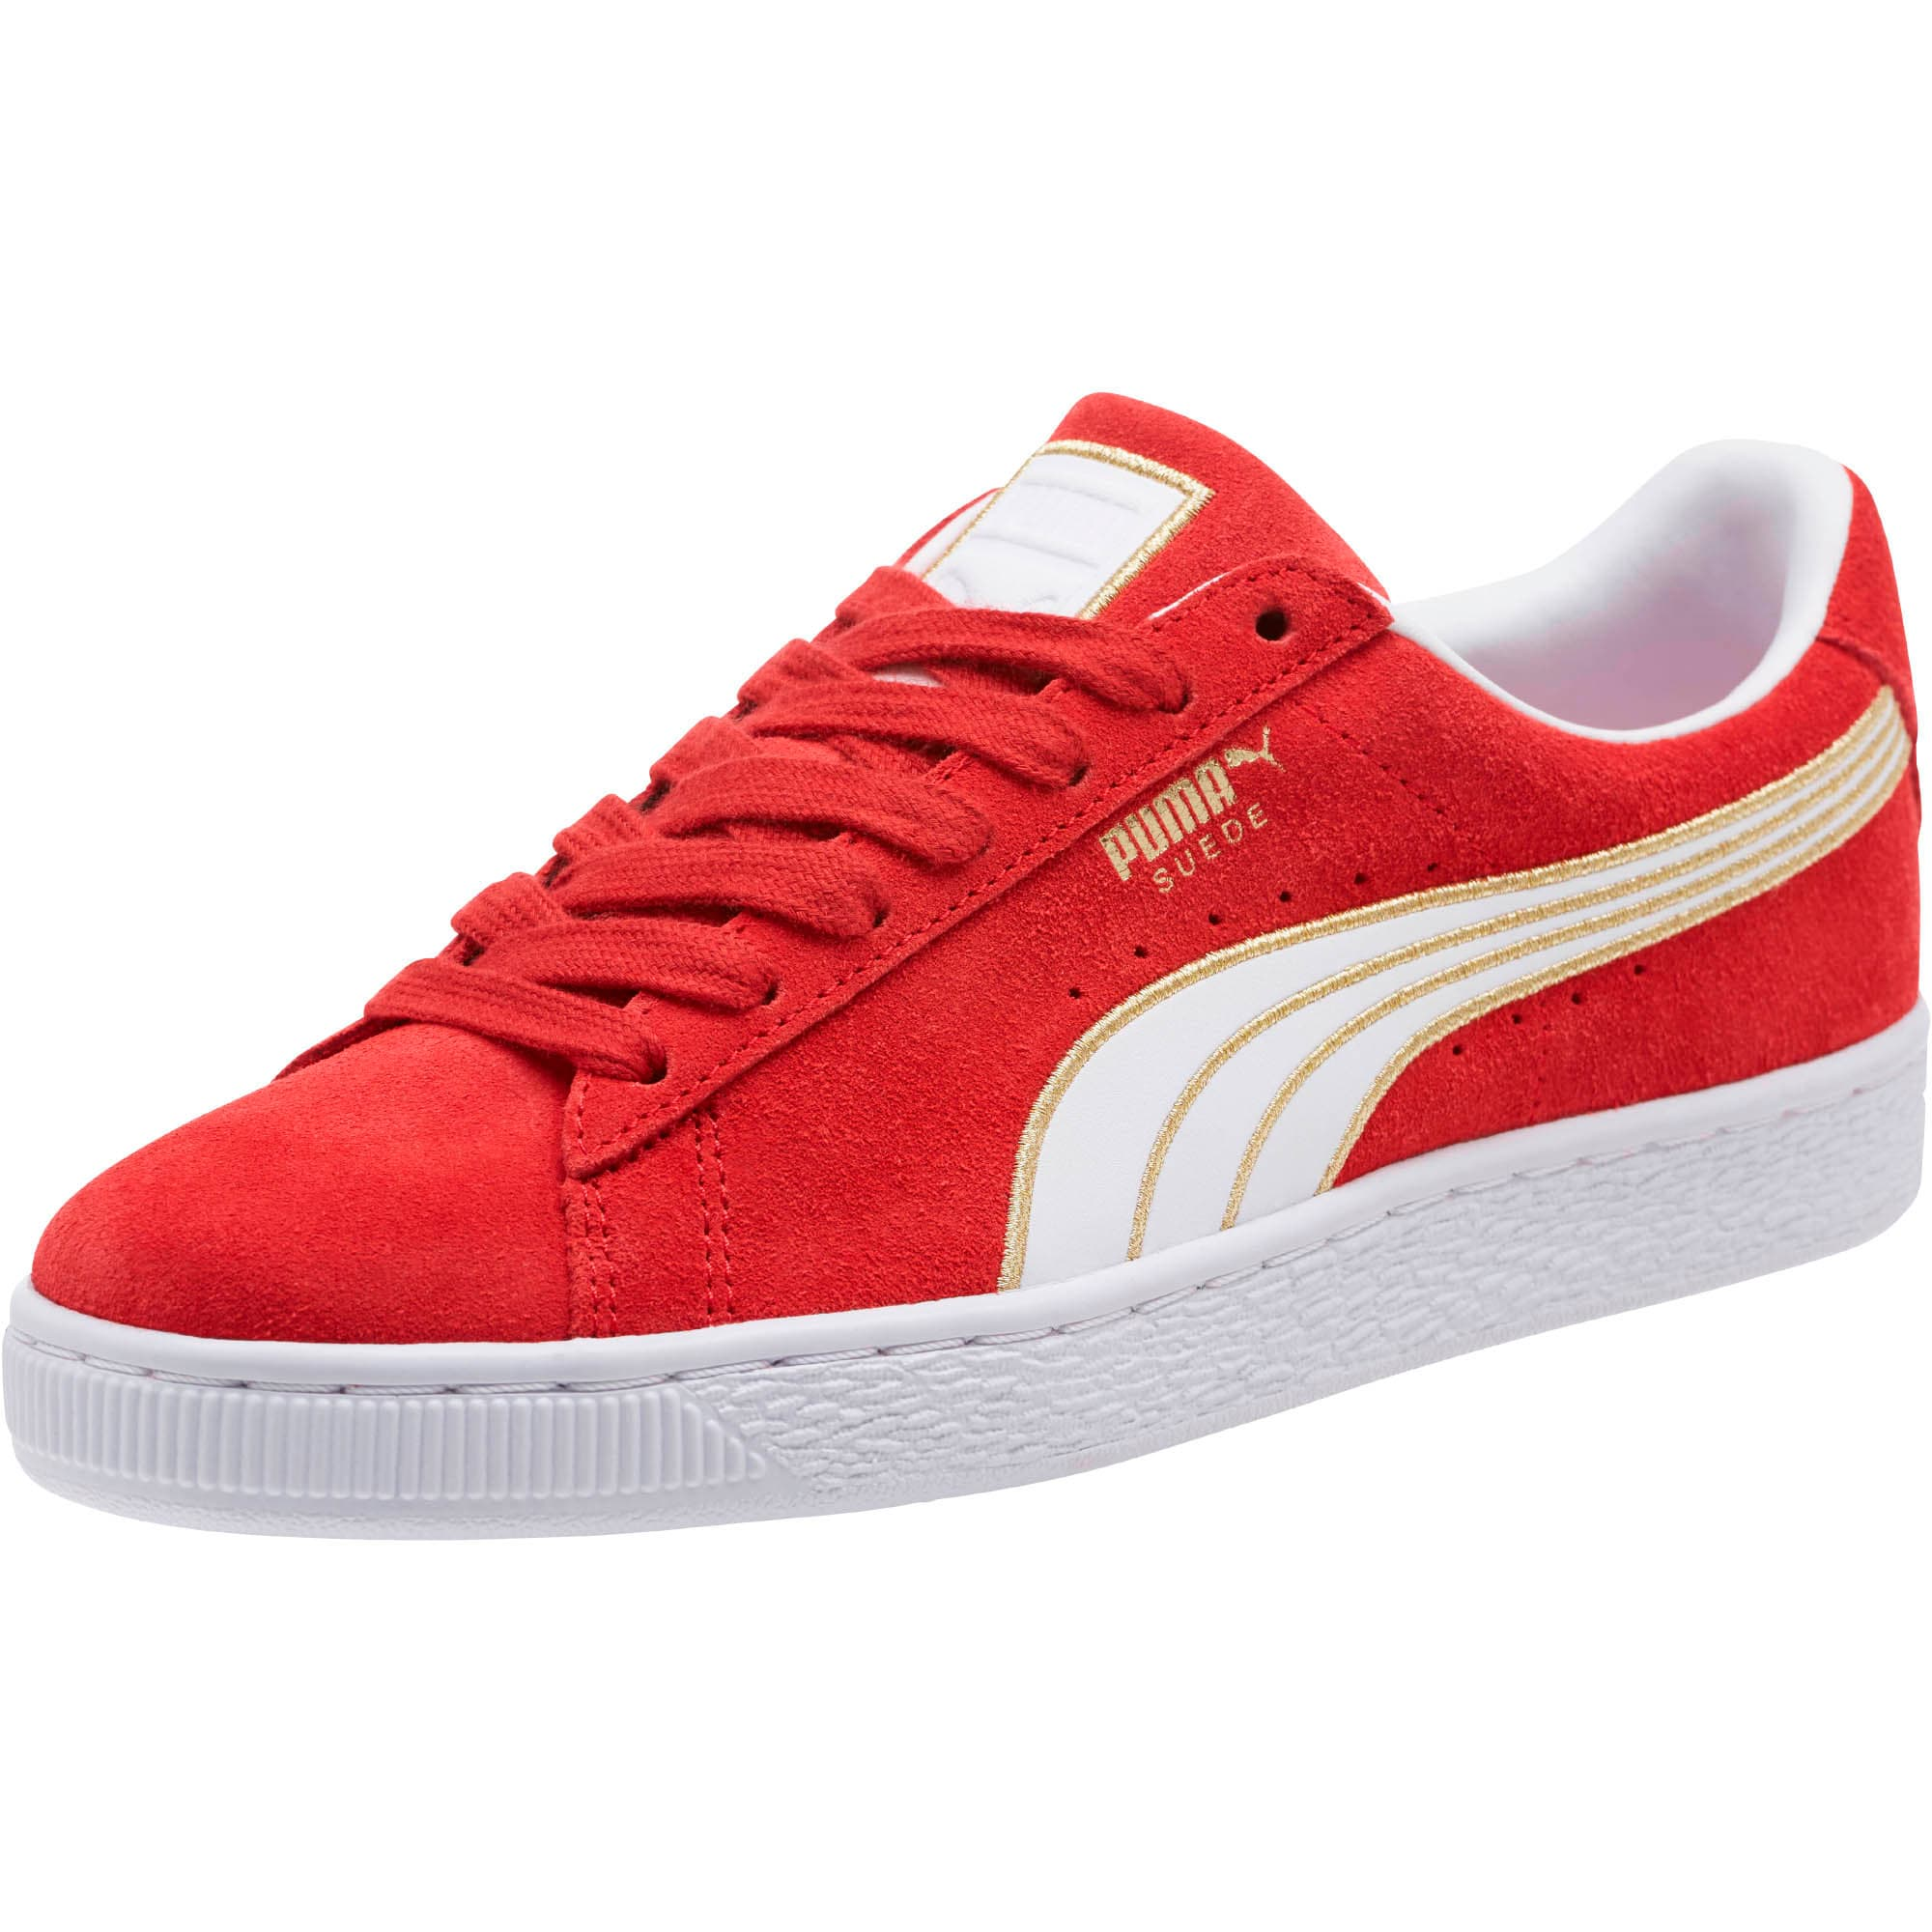 Thumbnail 1 of Suede Varsity Women's Sneakers, Ribbon Red-Puma White, medium